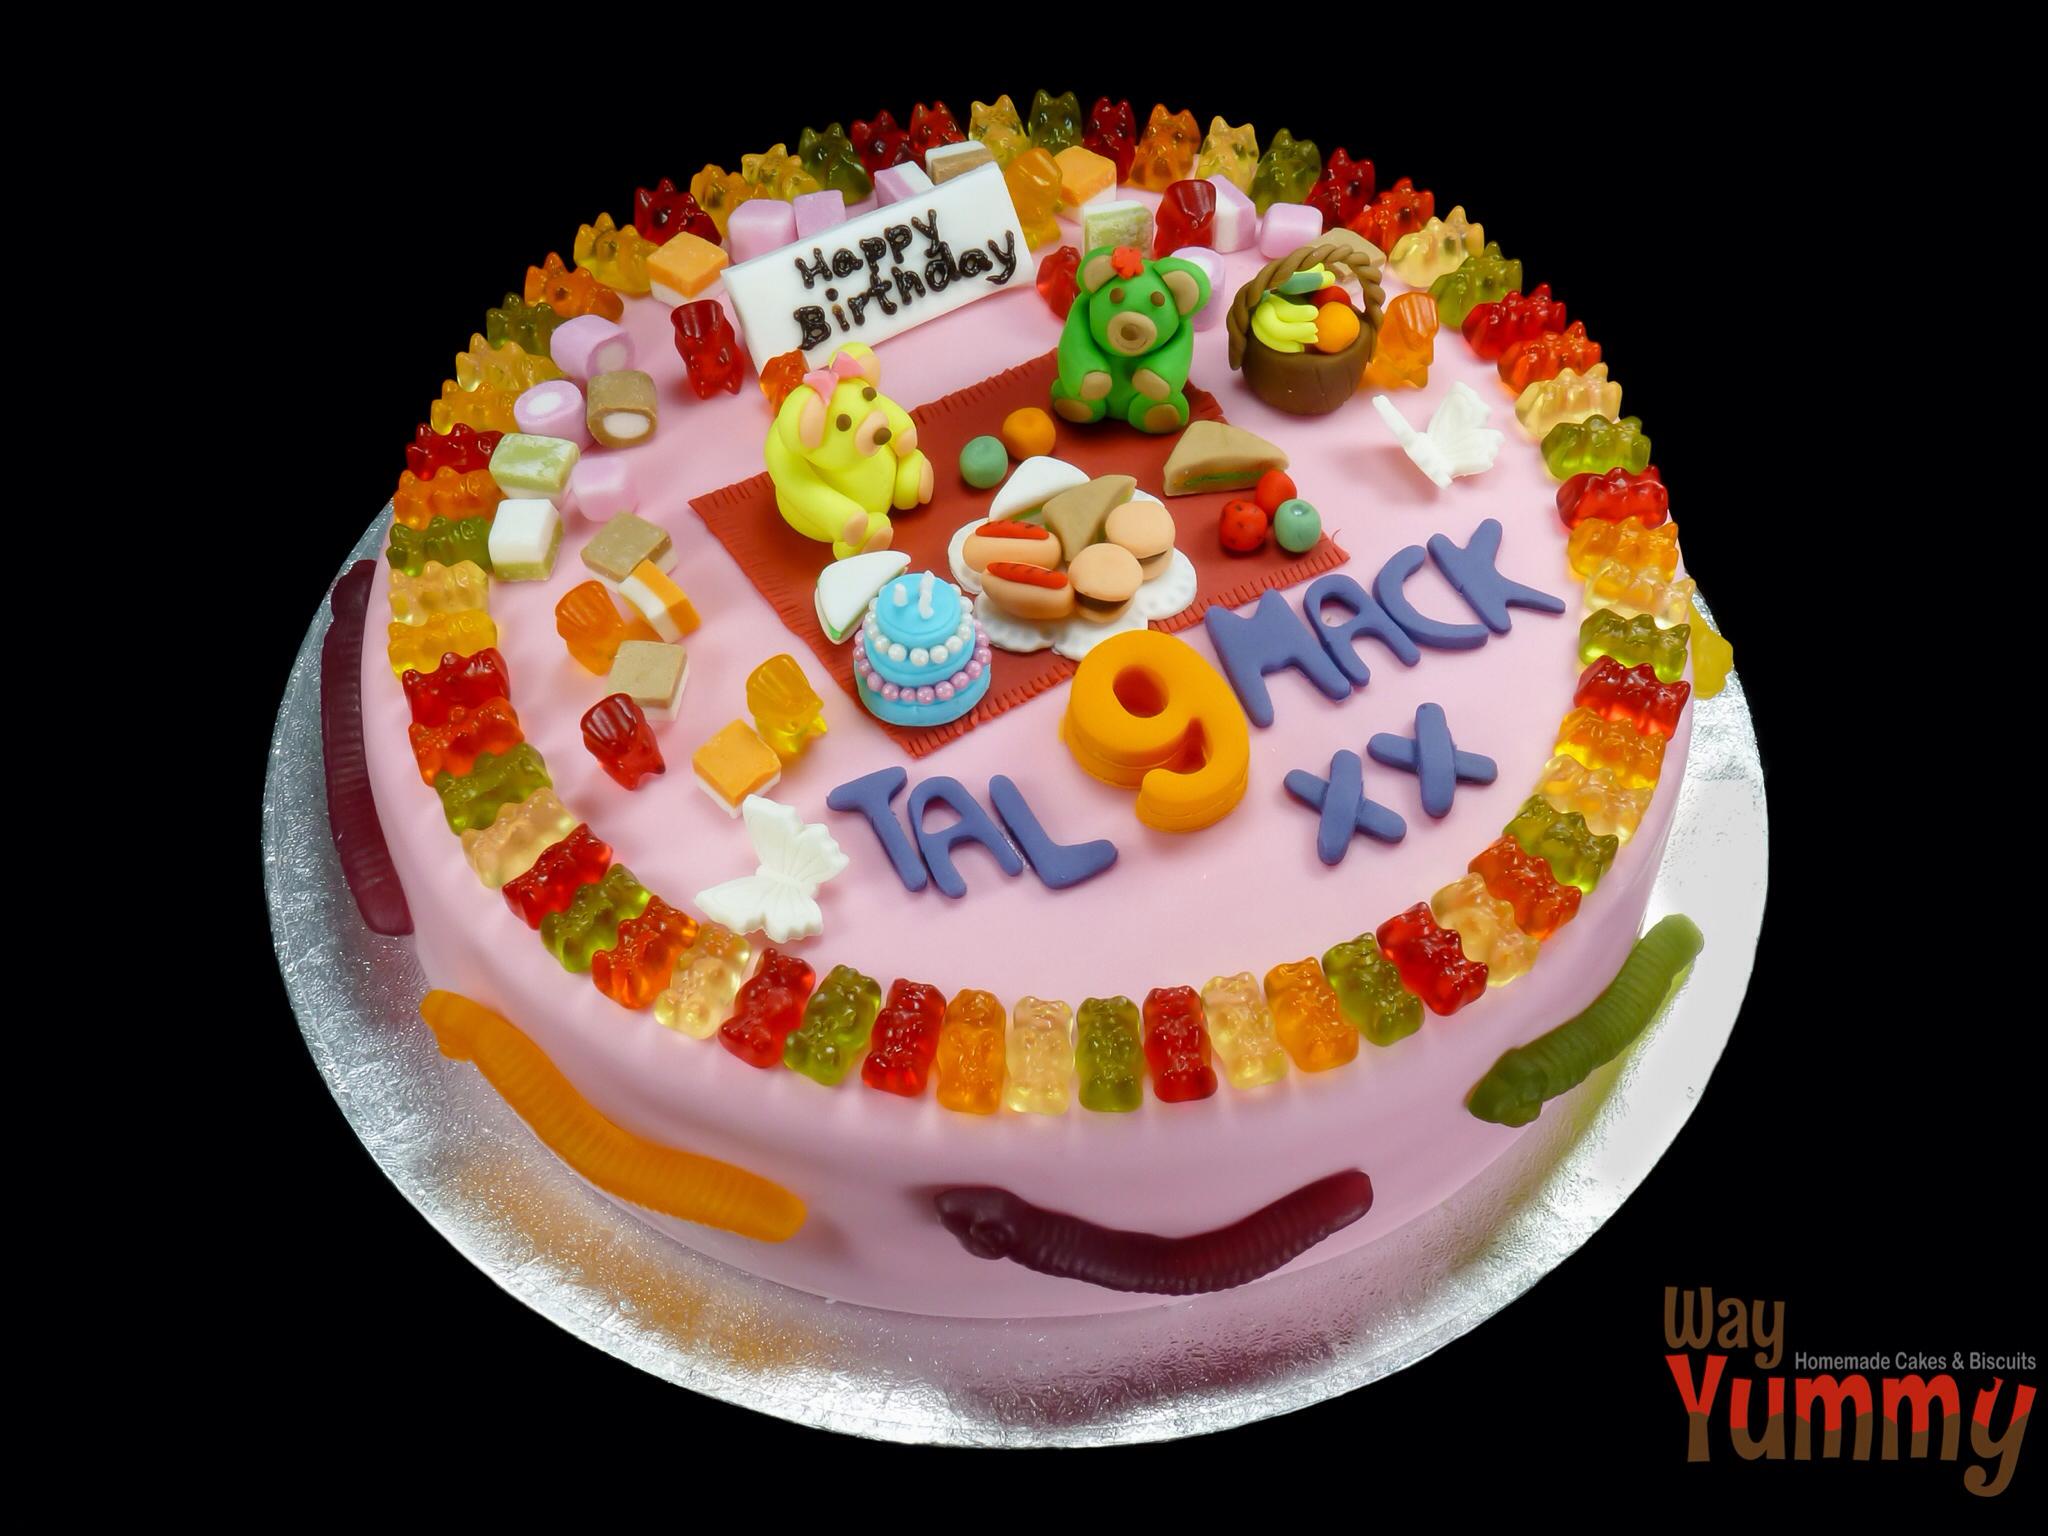 Filegummy Bear Cake 13627242753g Wikimedia Commons